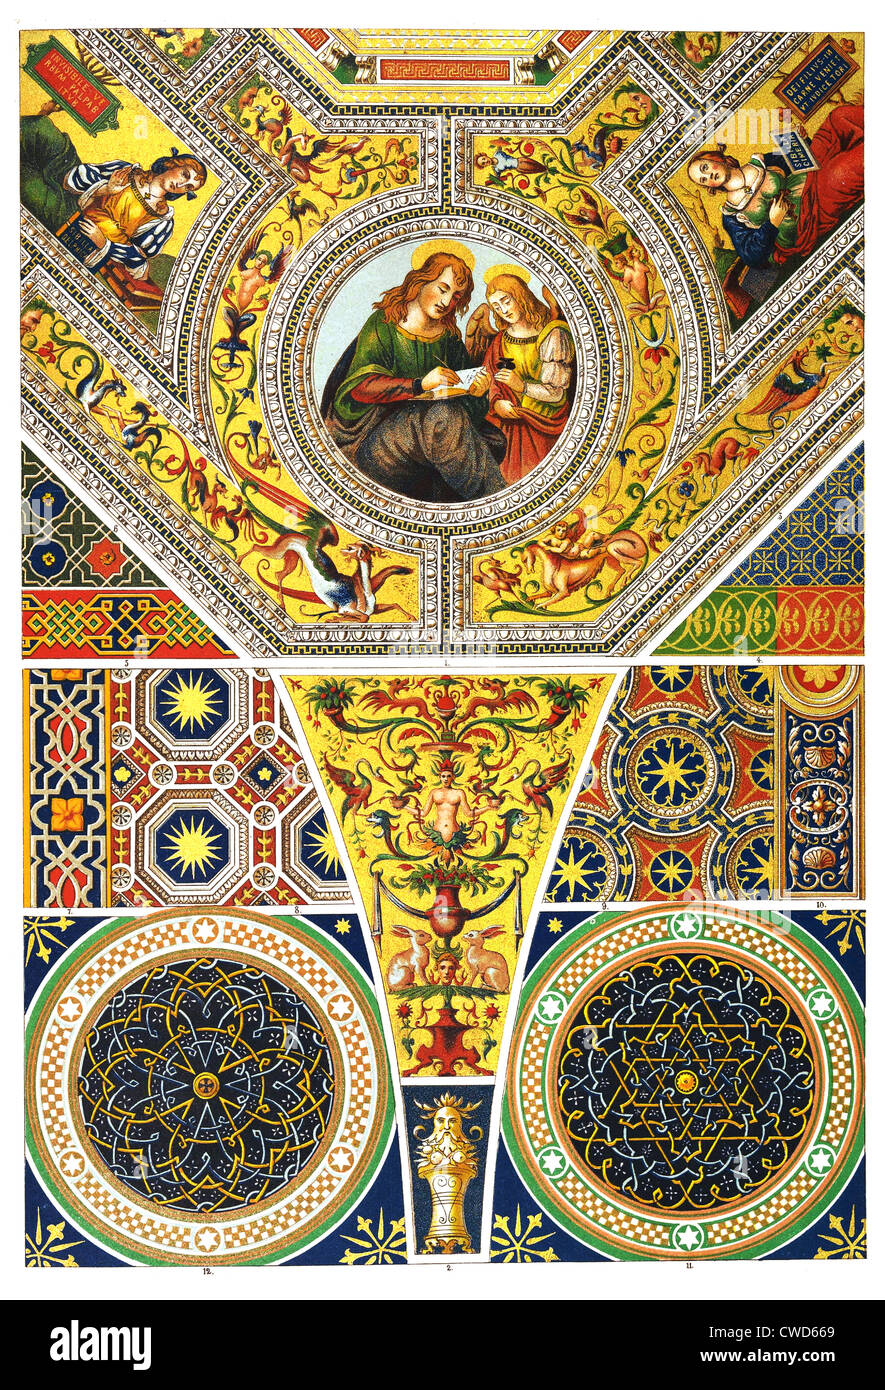 Techo pintado renacentista italiana Imagen De Stock